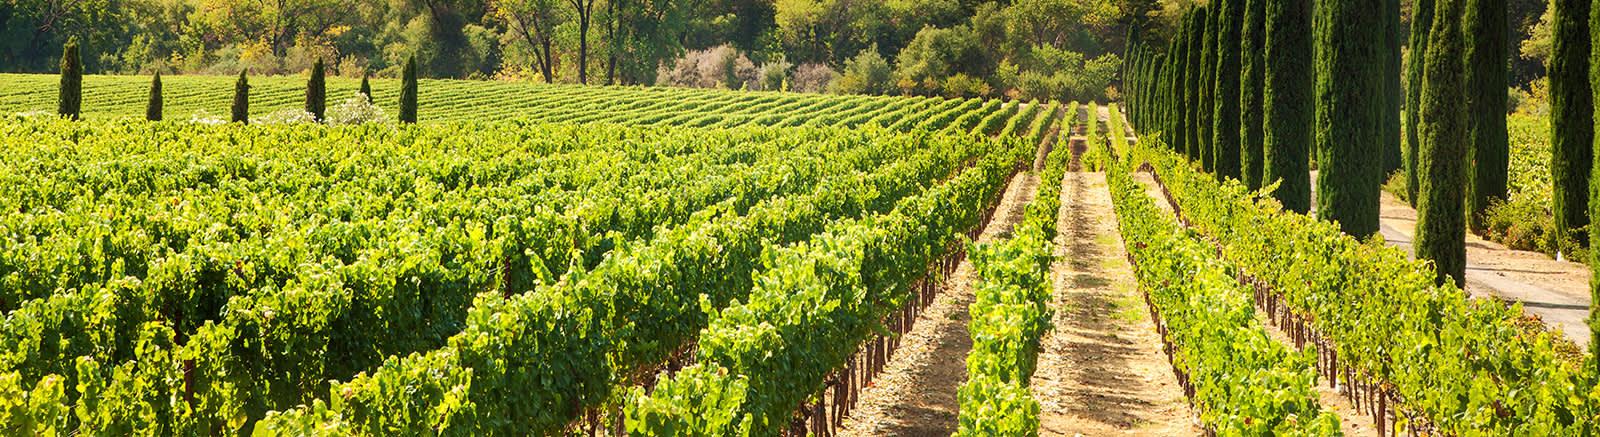 Texas Wine Country of Horseshoe Bay